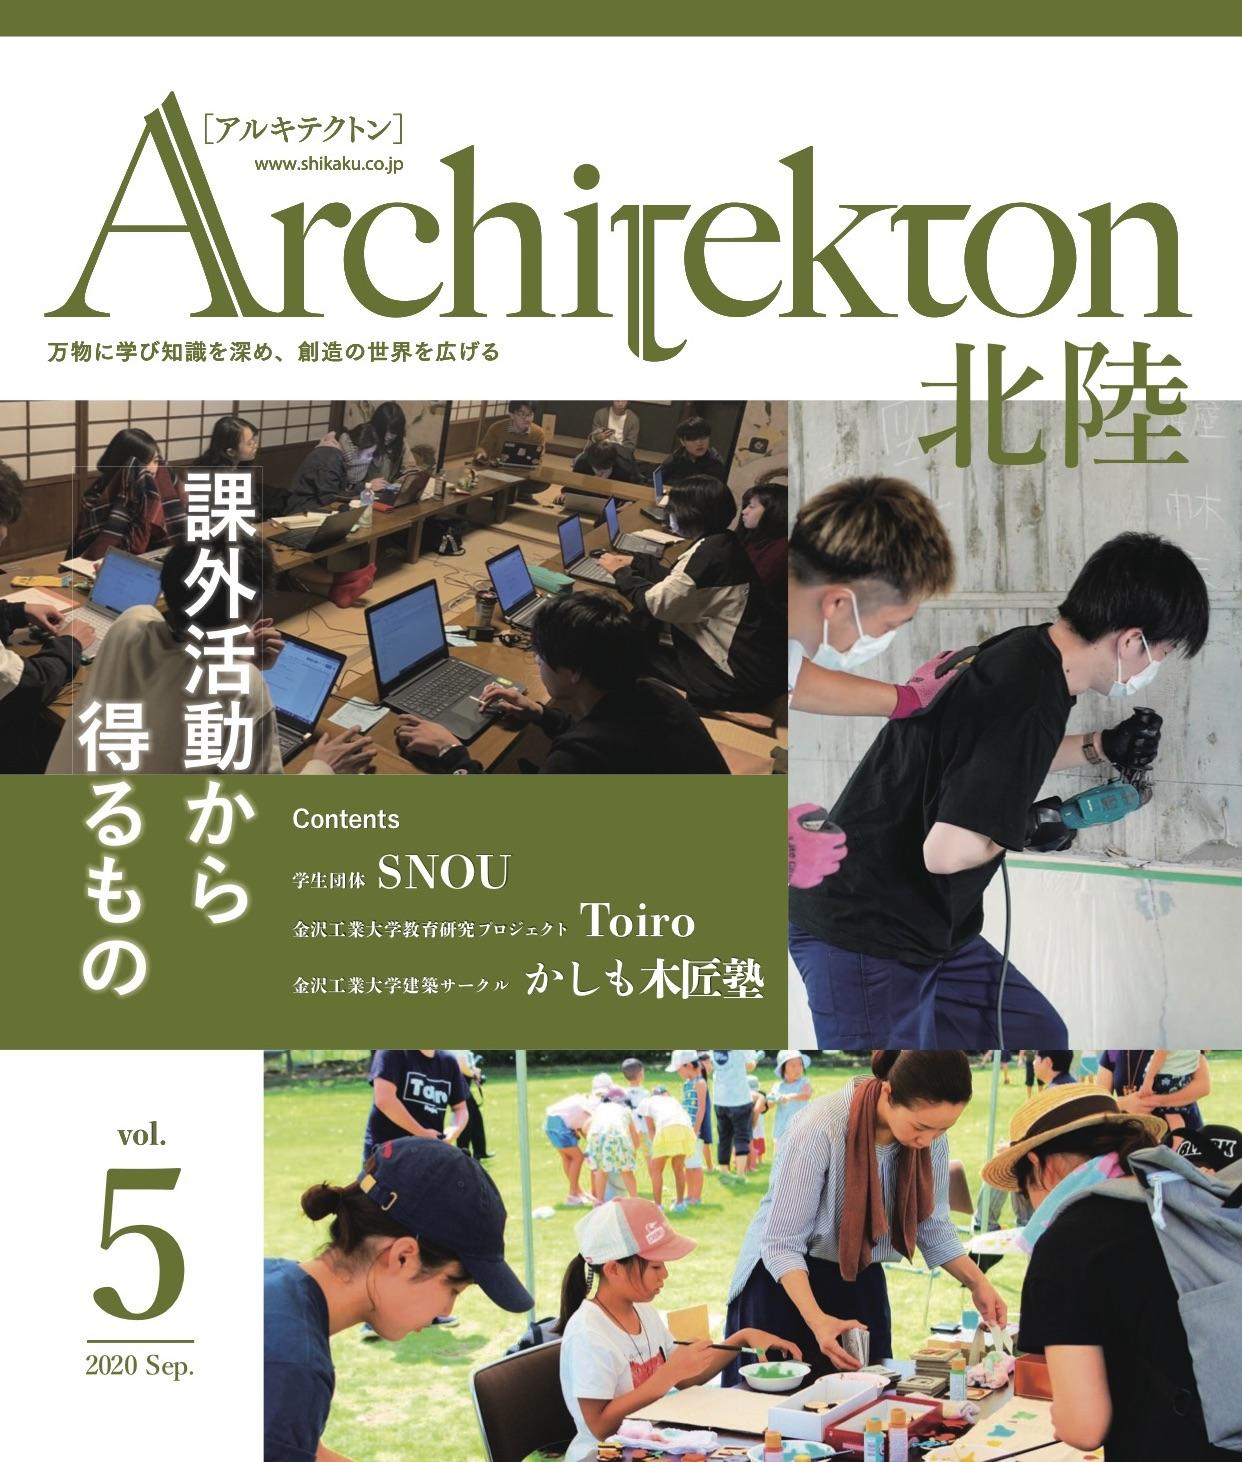 Architeckton 北陸 vol.5